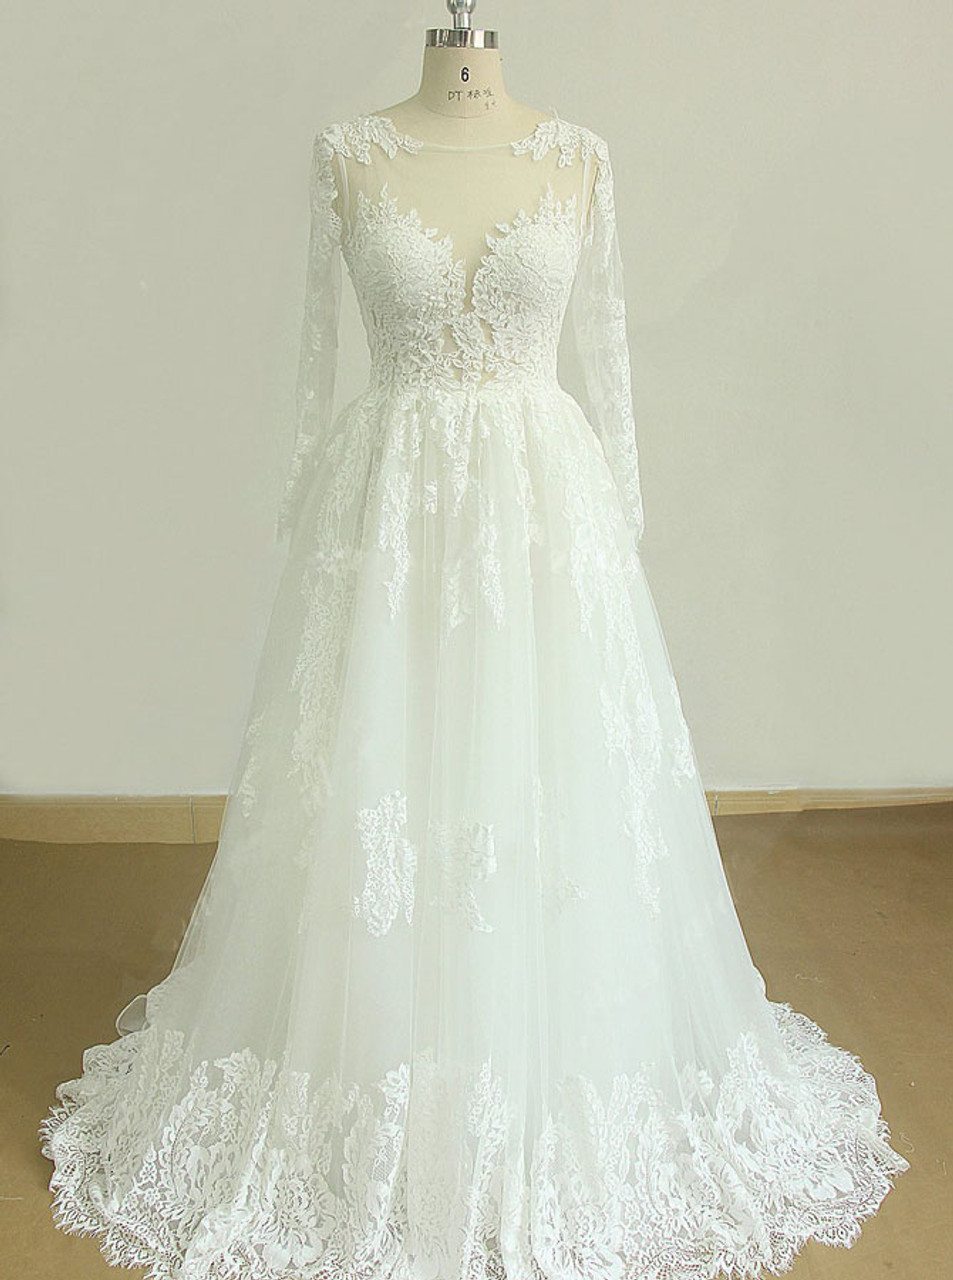 Lace Wedding Dress With Long Sleevescutout Back Bridal Dress11601